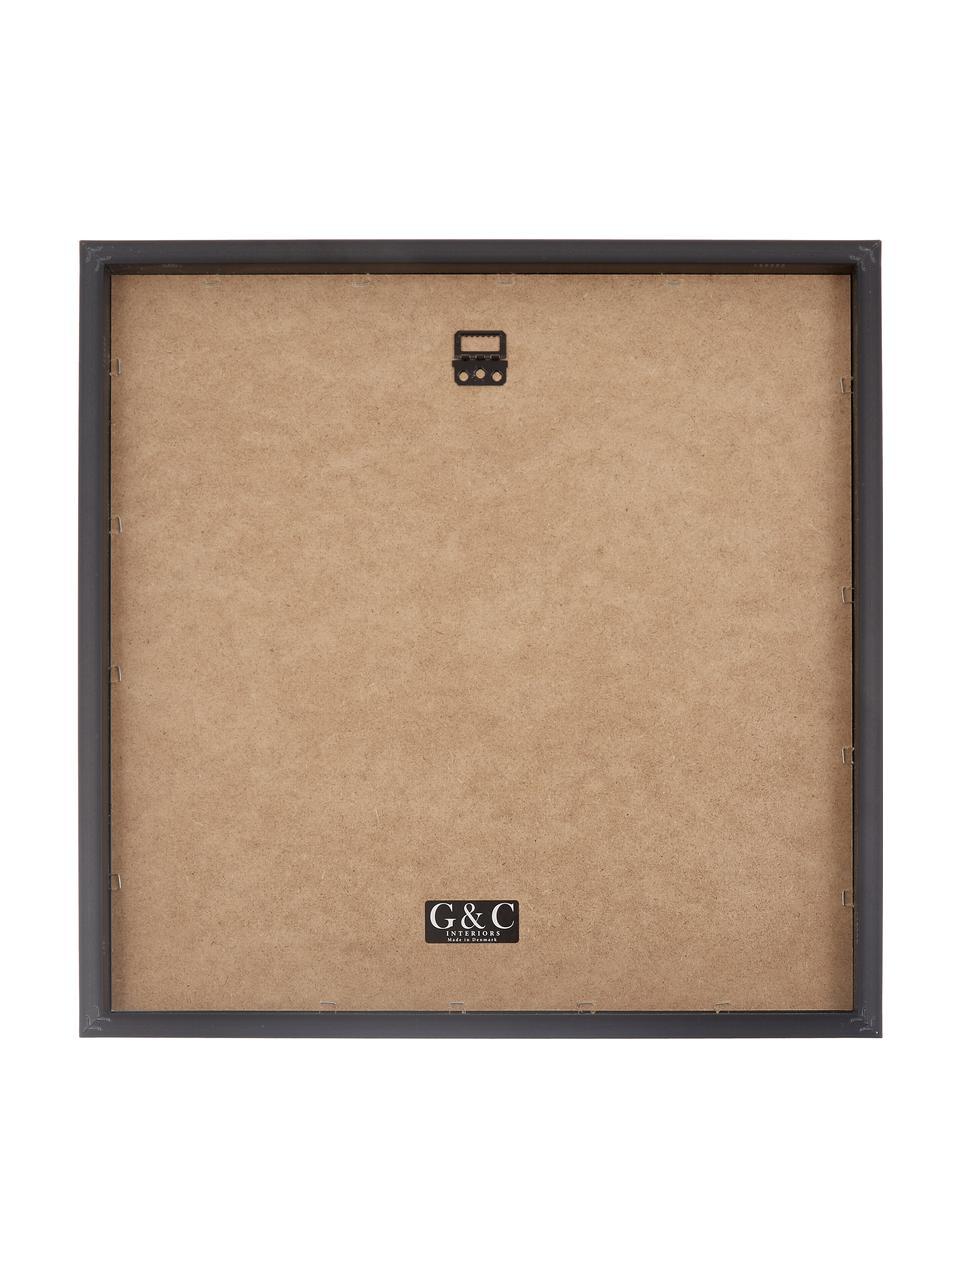 Ingelijste digitale print Senses I, MDF, gietijzer, glas, Print: zwart, beige. Lijst: zwart, 40 x 40 cm